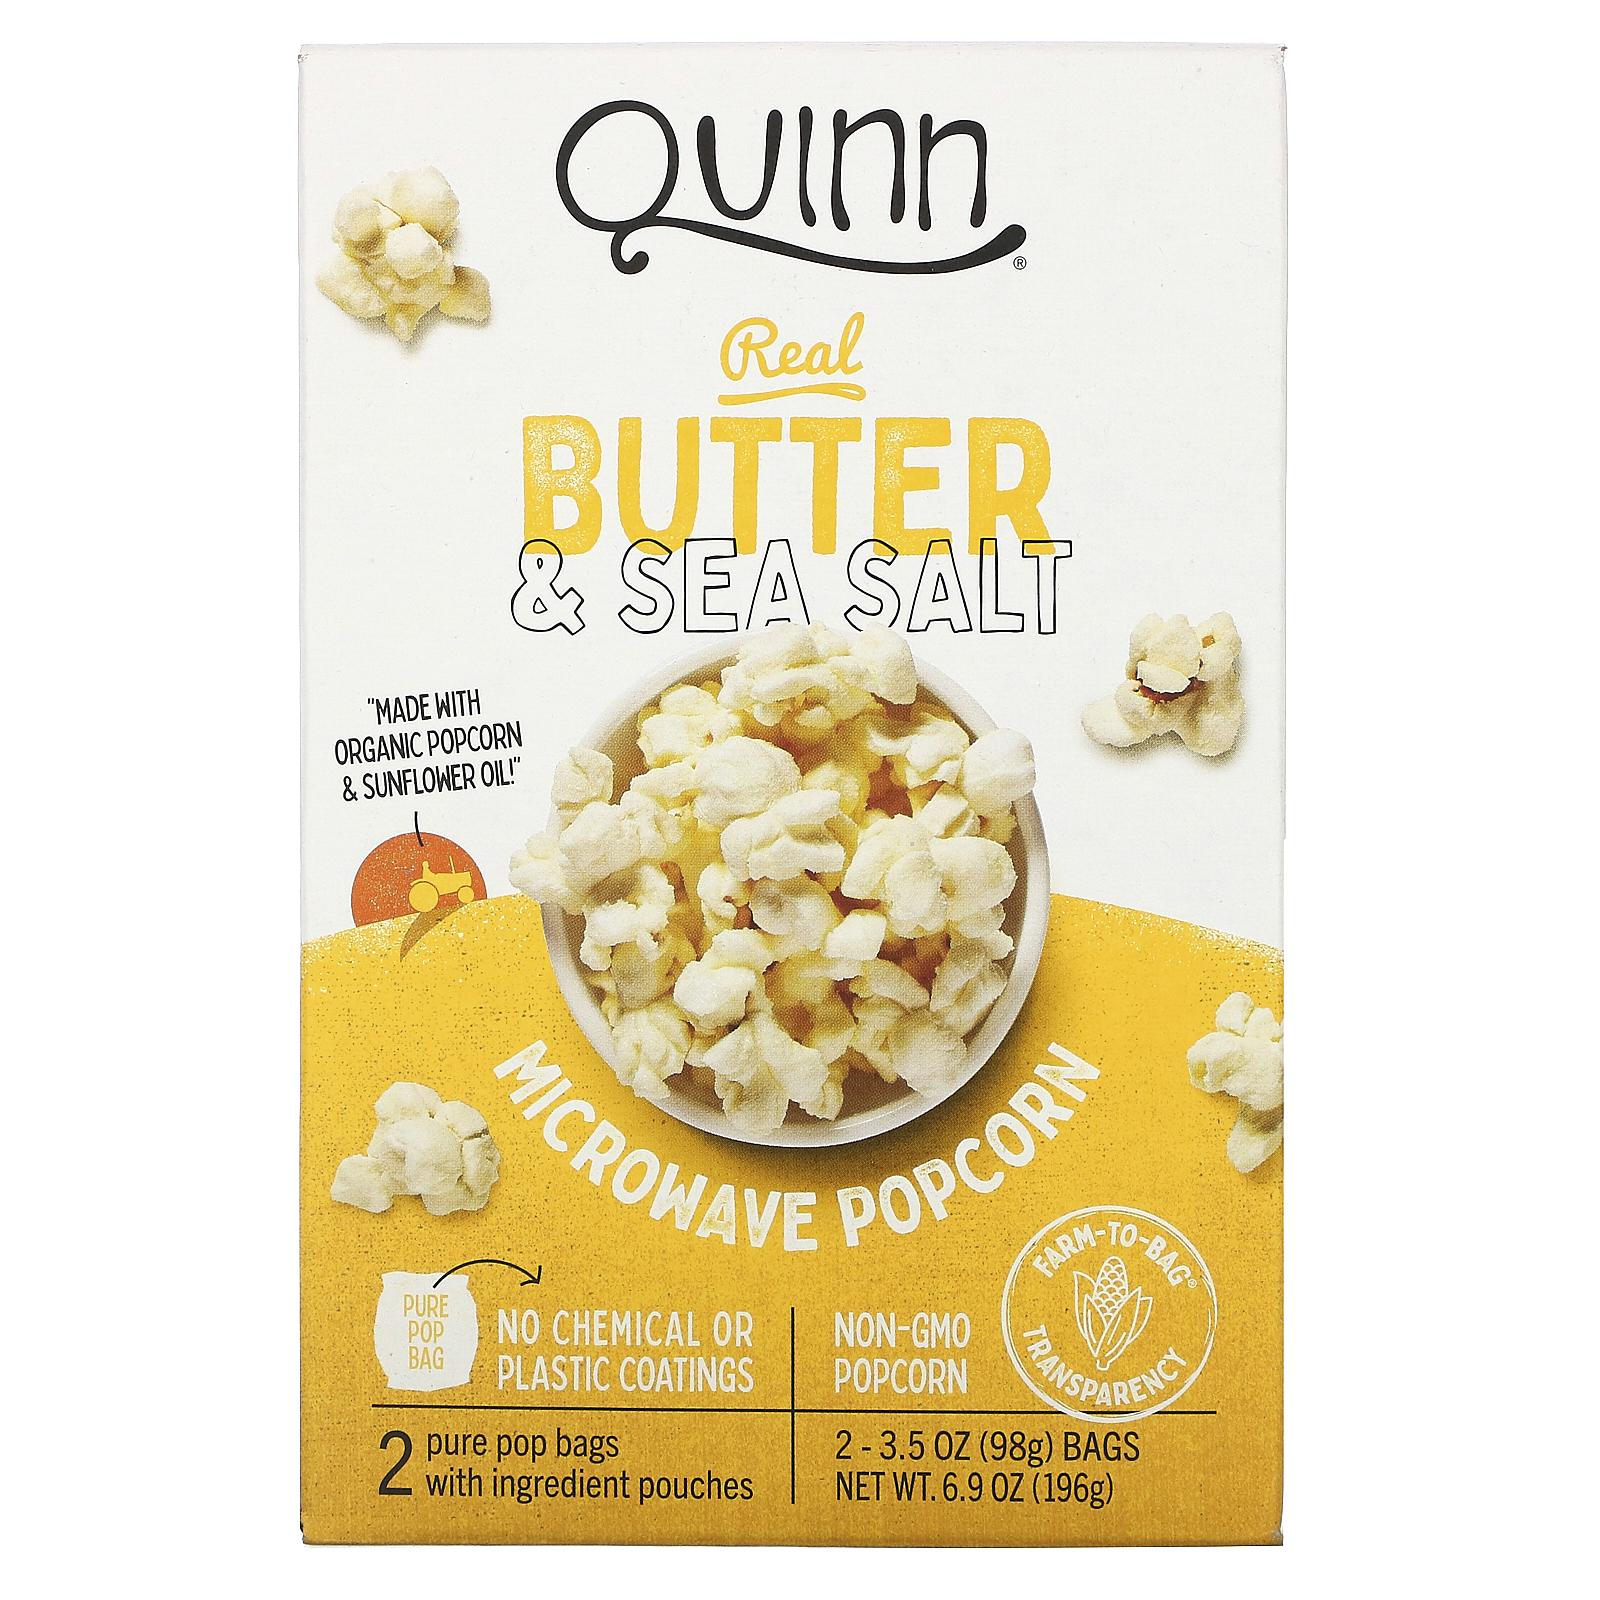 quinn popcorn microwave popcorn real butter sea salt 2 bags 3 5 oz 98 g each